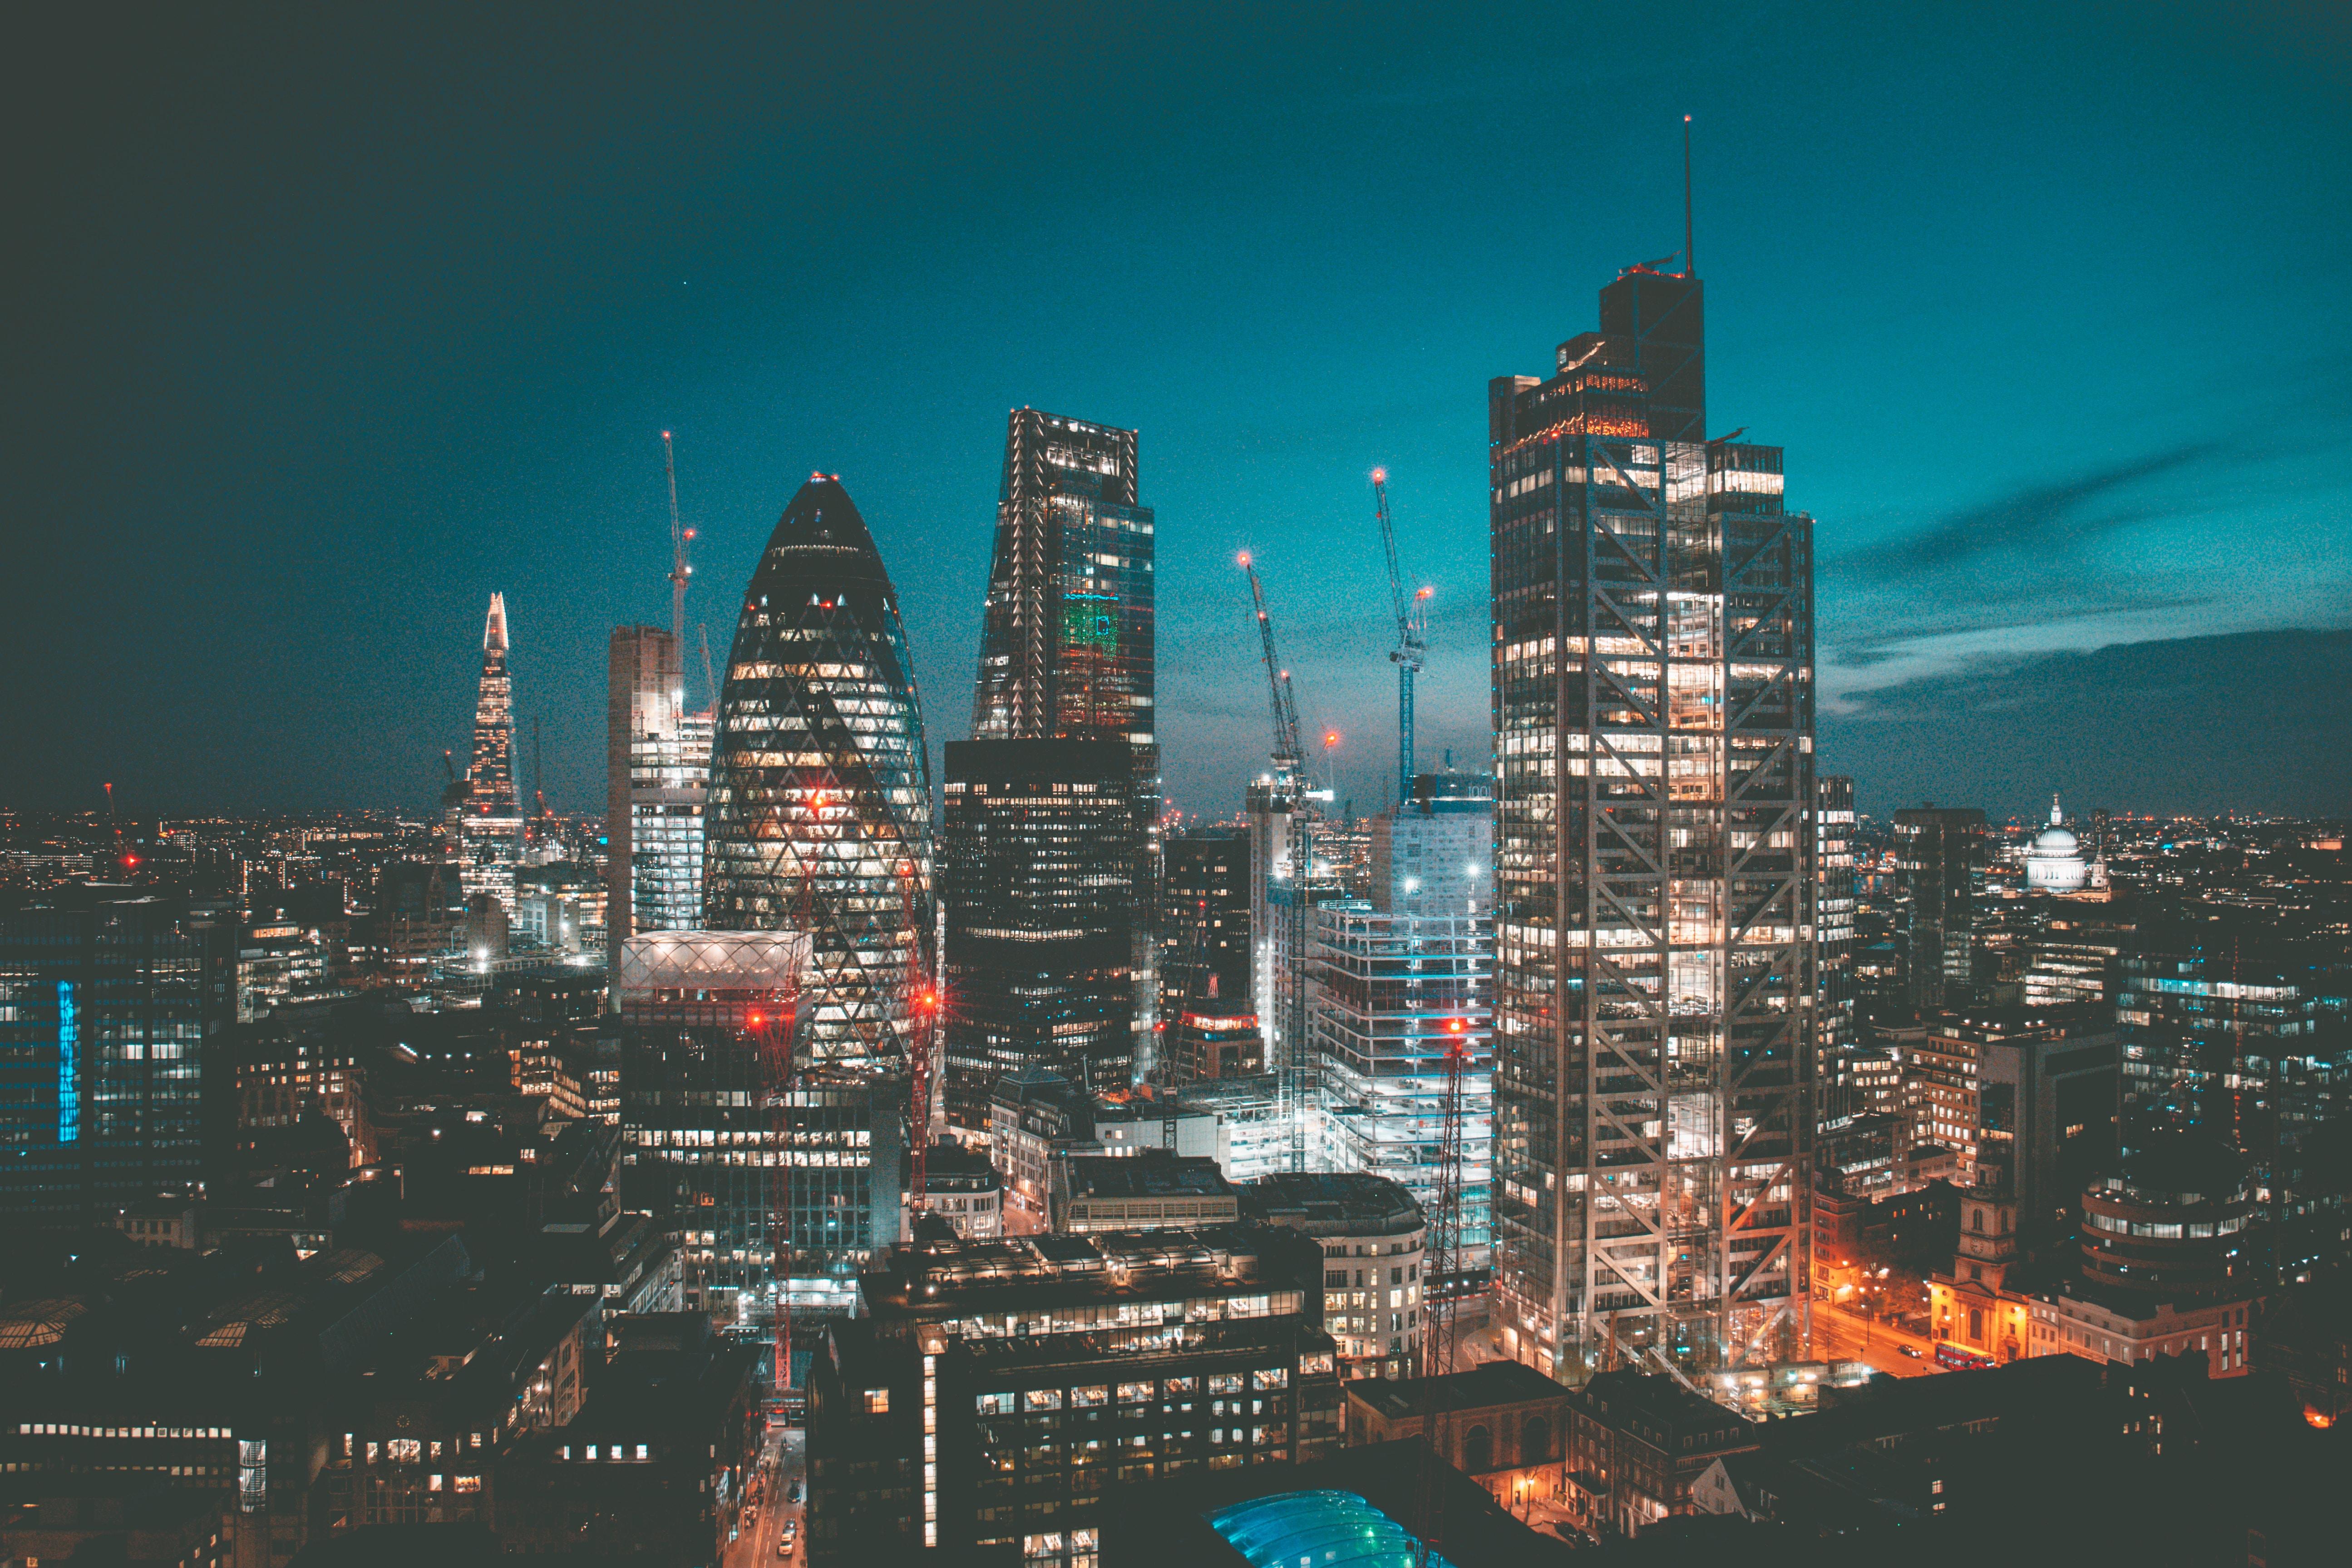 high-angle photo of city skyline